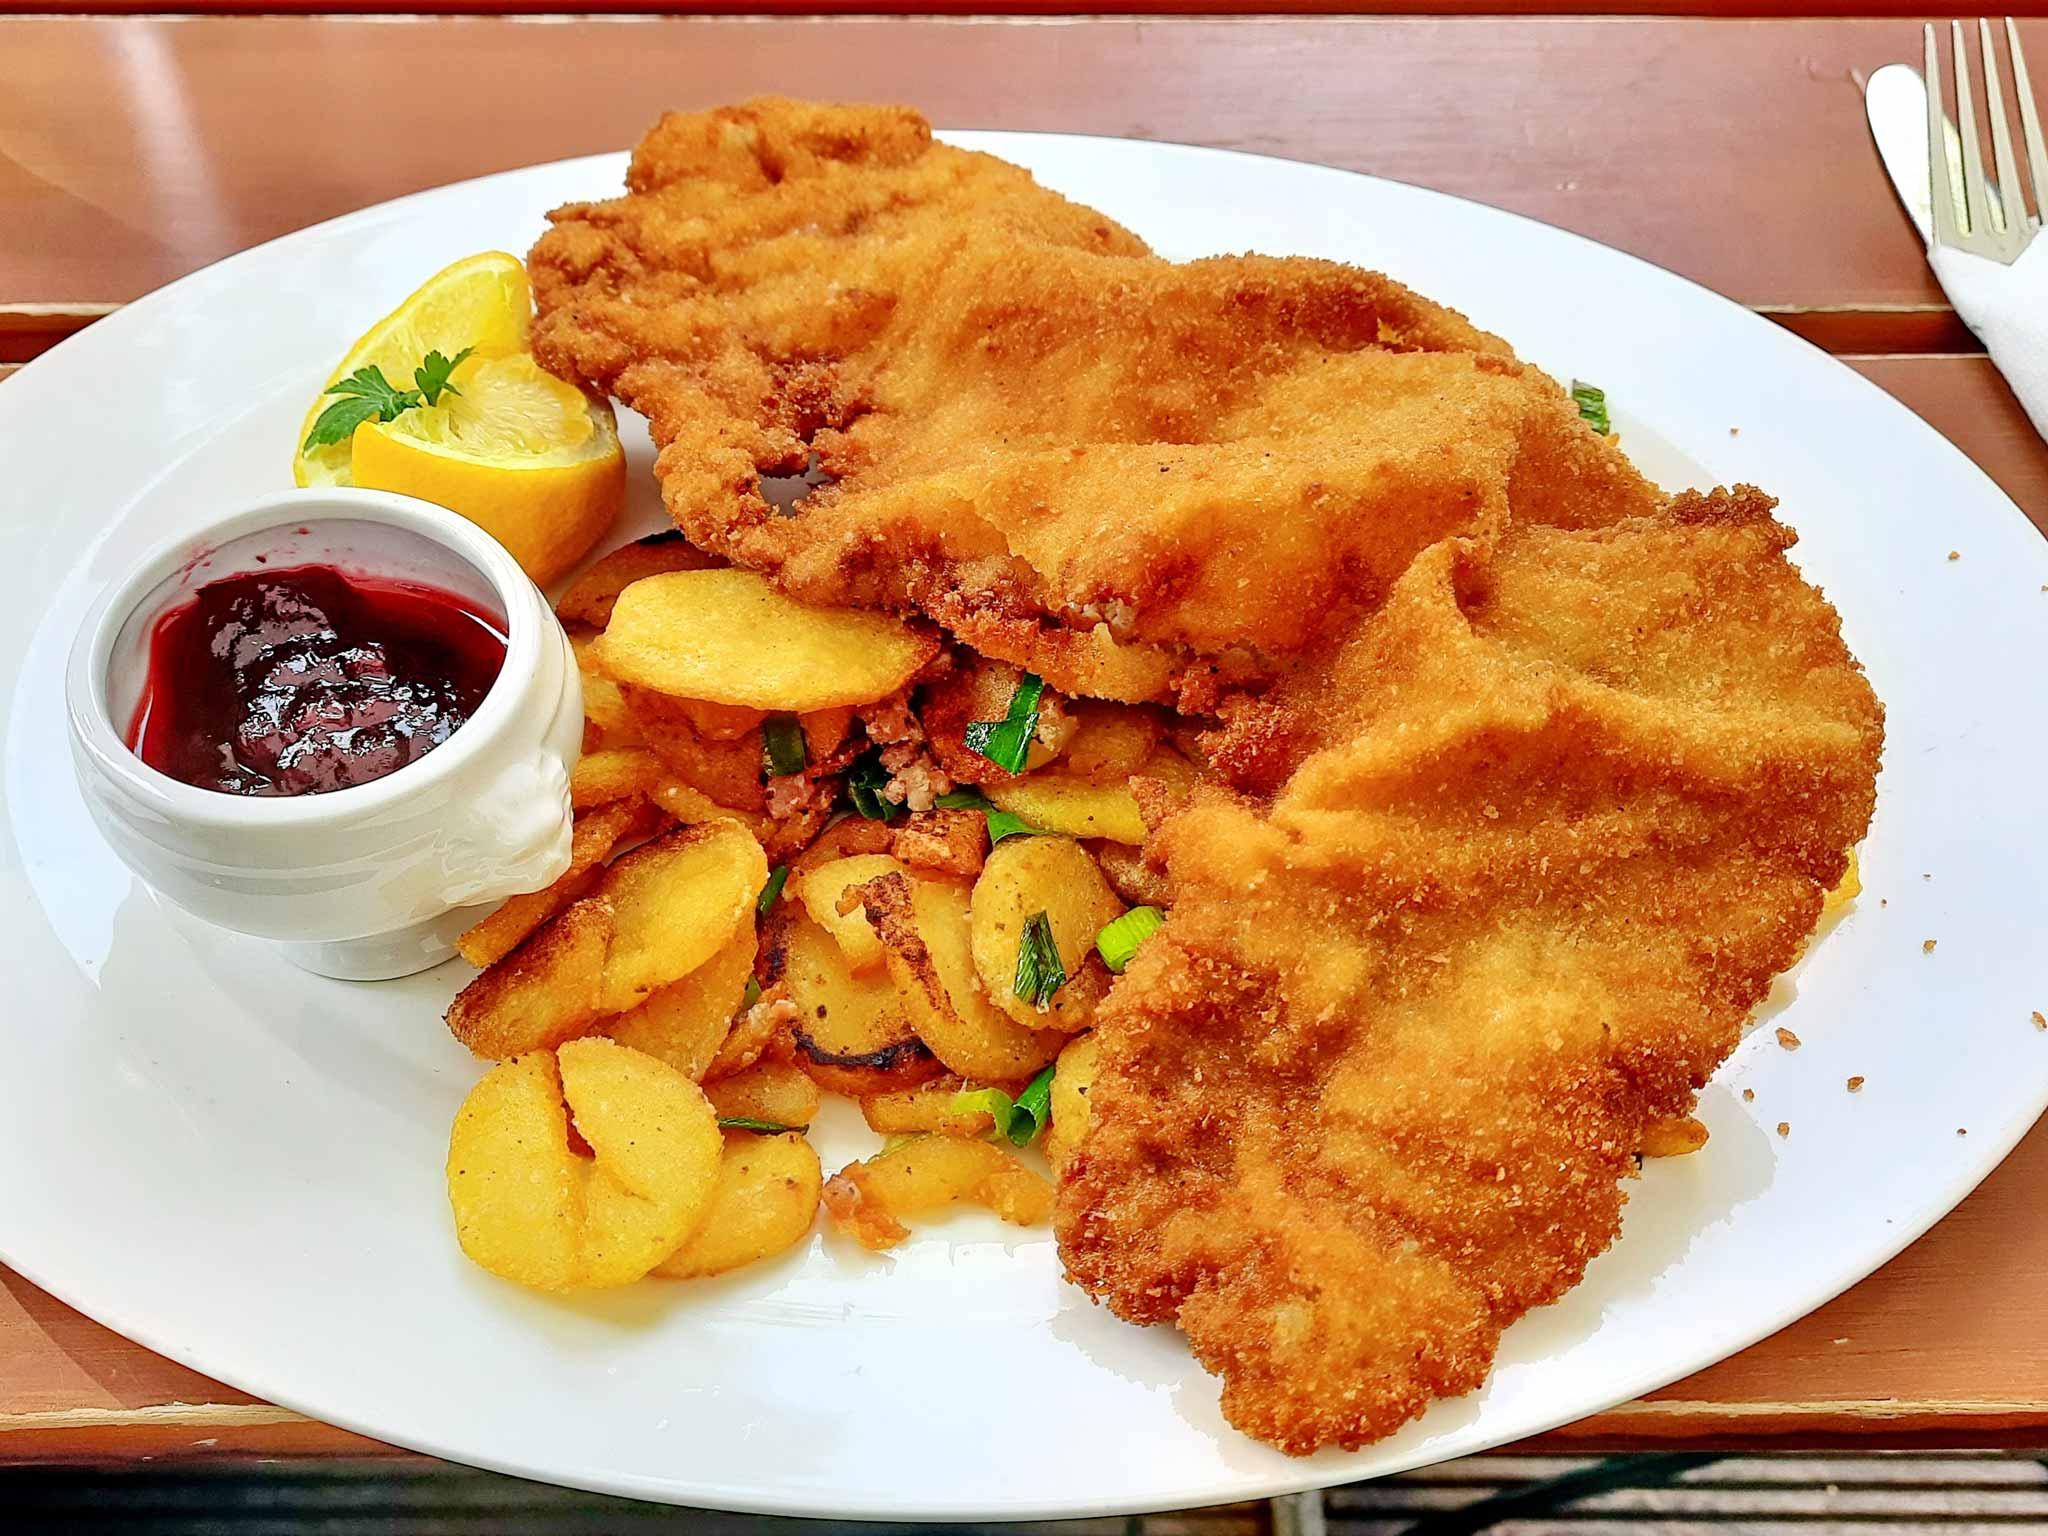 Cafe Walker Ueberlingen Bodensee Wiener Schnitzel